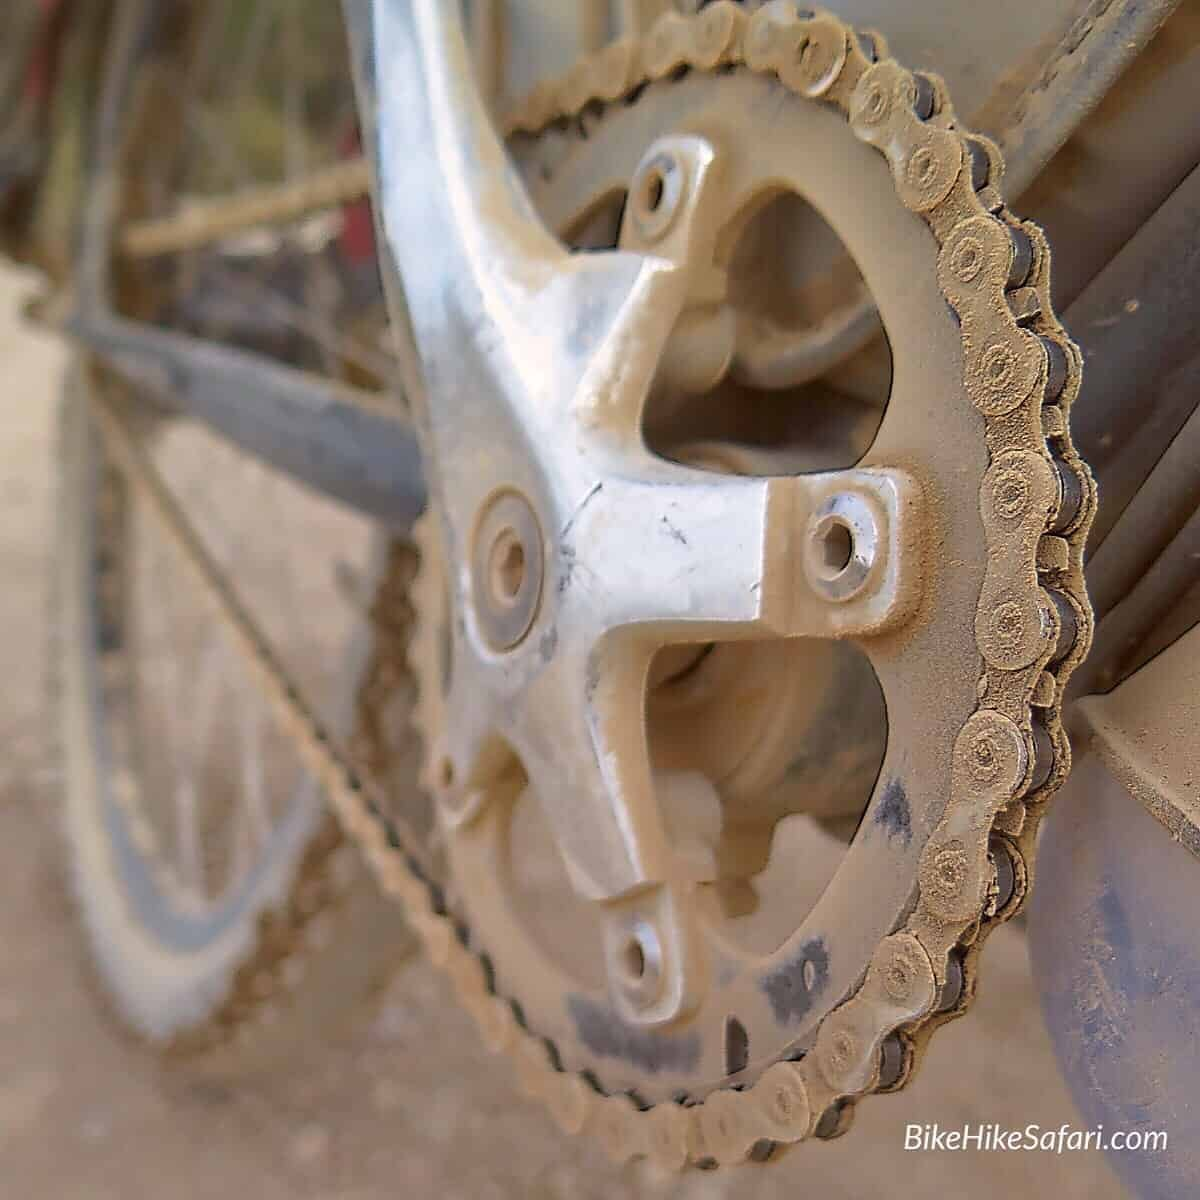 dirty chain